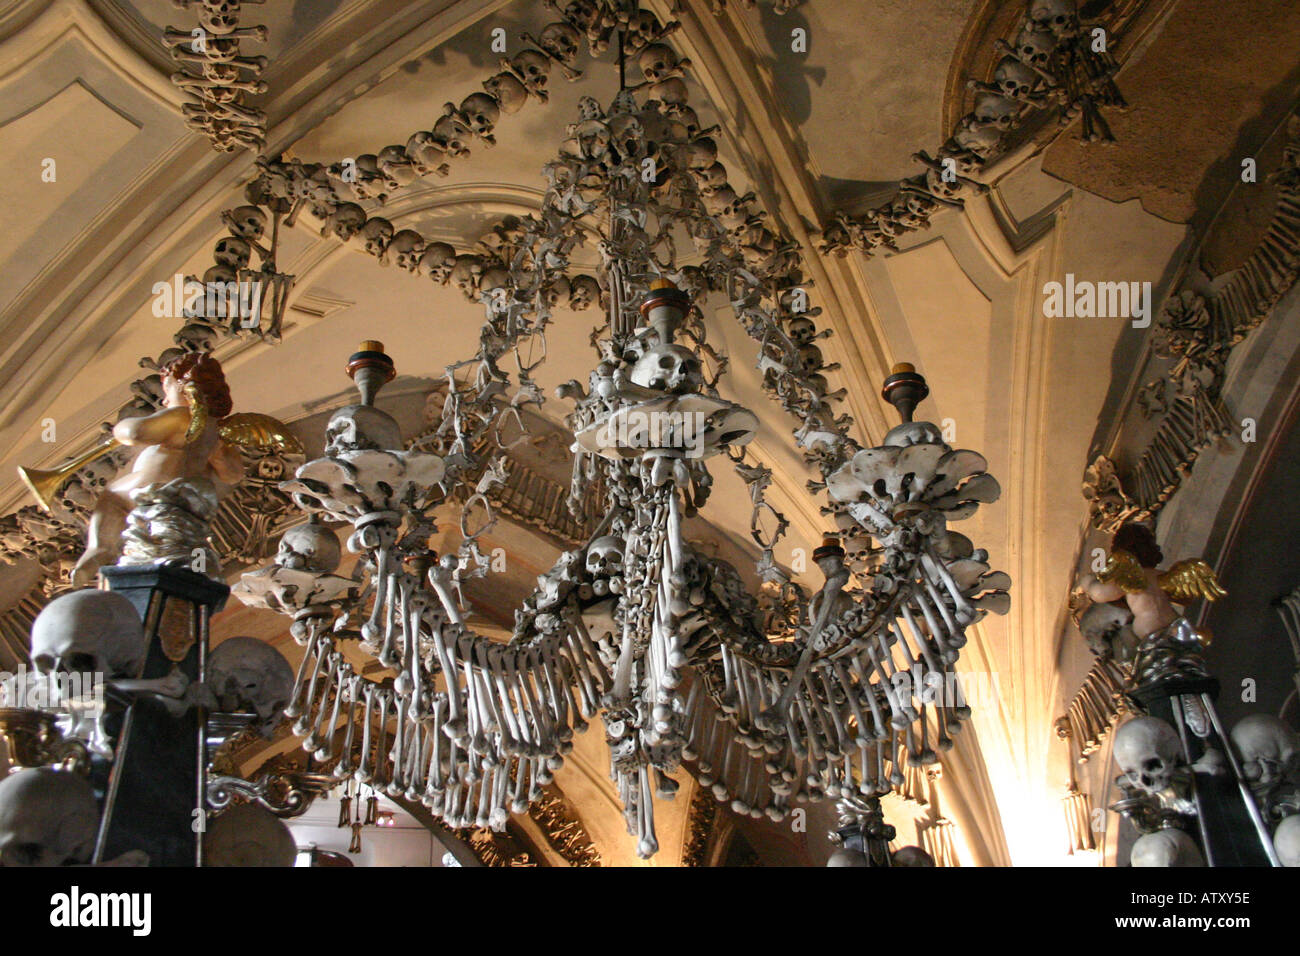 Kronleuchter Mit Engeln ~ Kutna hora knochen kapelle kronleuchter stockfoto bild